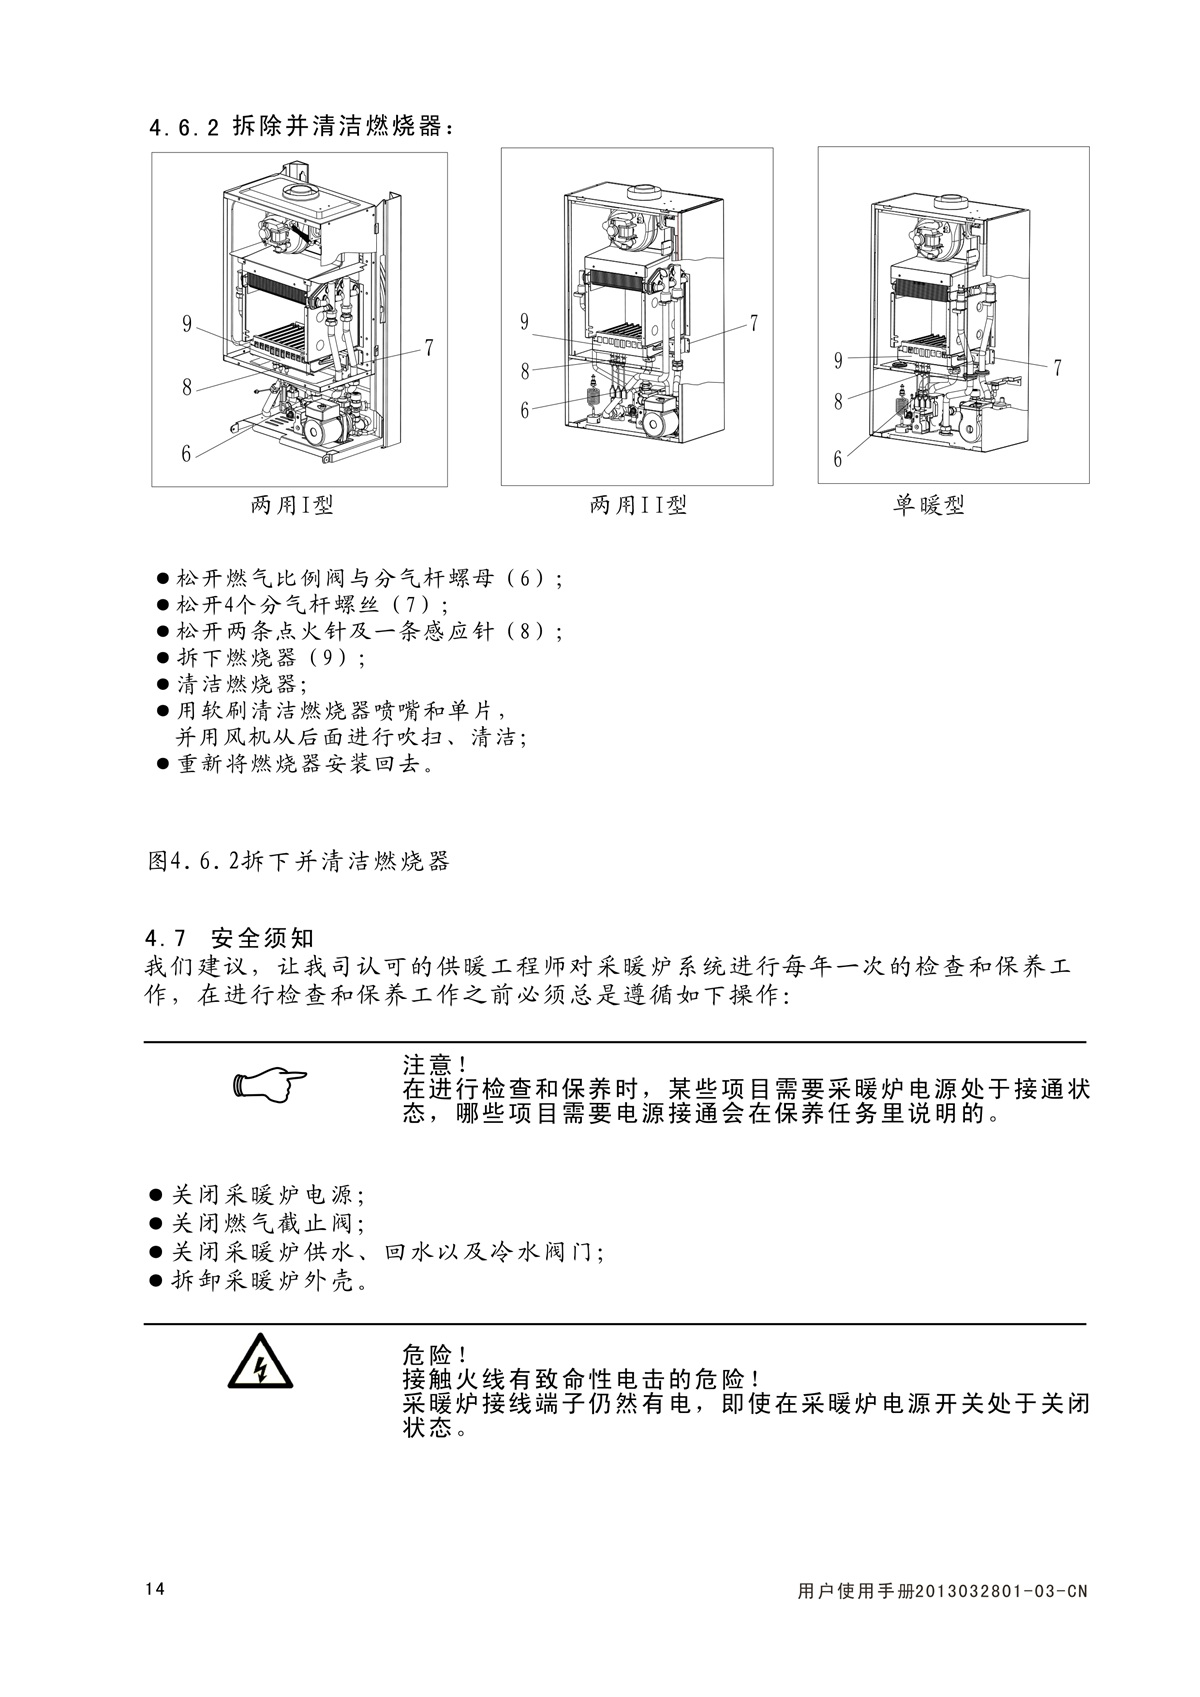 ES16A系列-用户使用手册-4_01.jpg